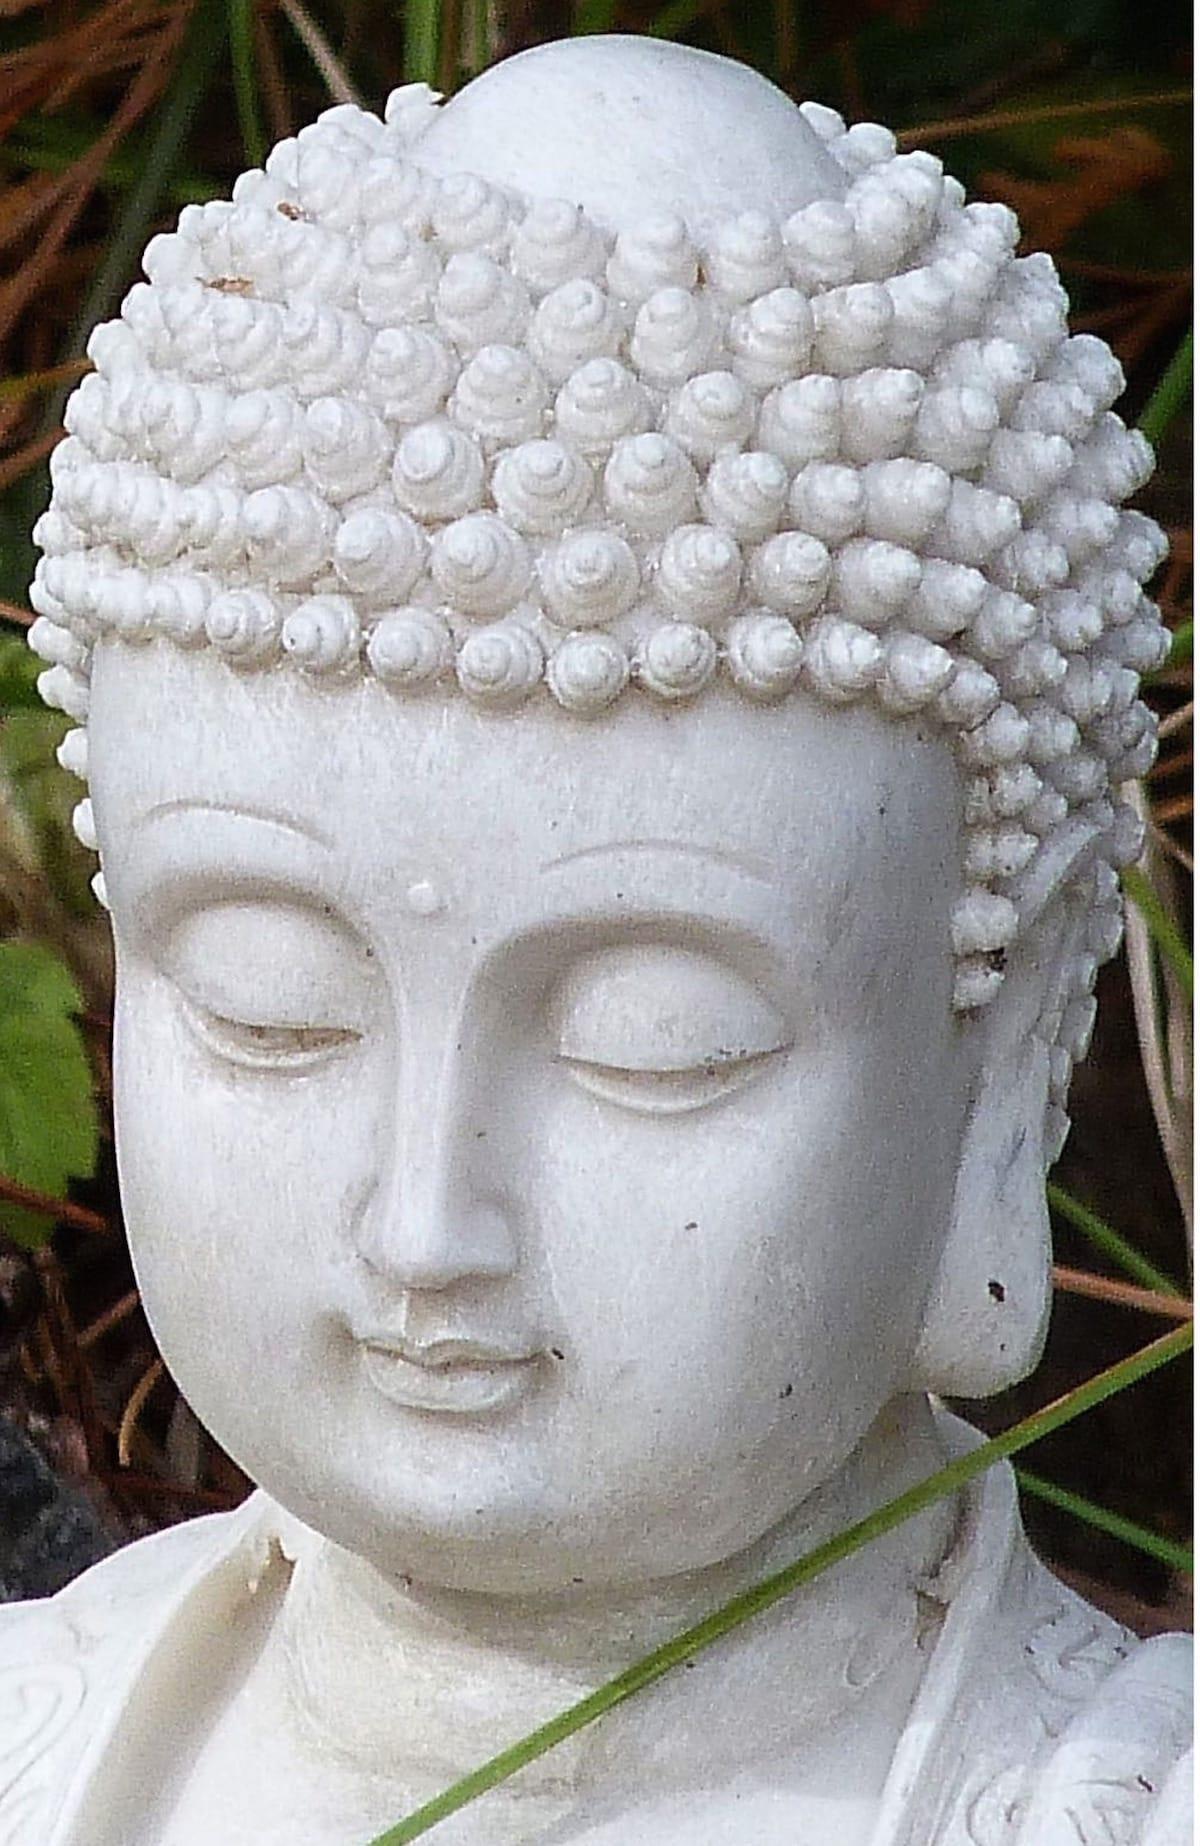 Meditation, Peace, Sakyong Mipham, Vajrayana / Tibetan Buddhism, Shambhala Sun, Lion's Roar, Buddhism